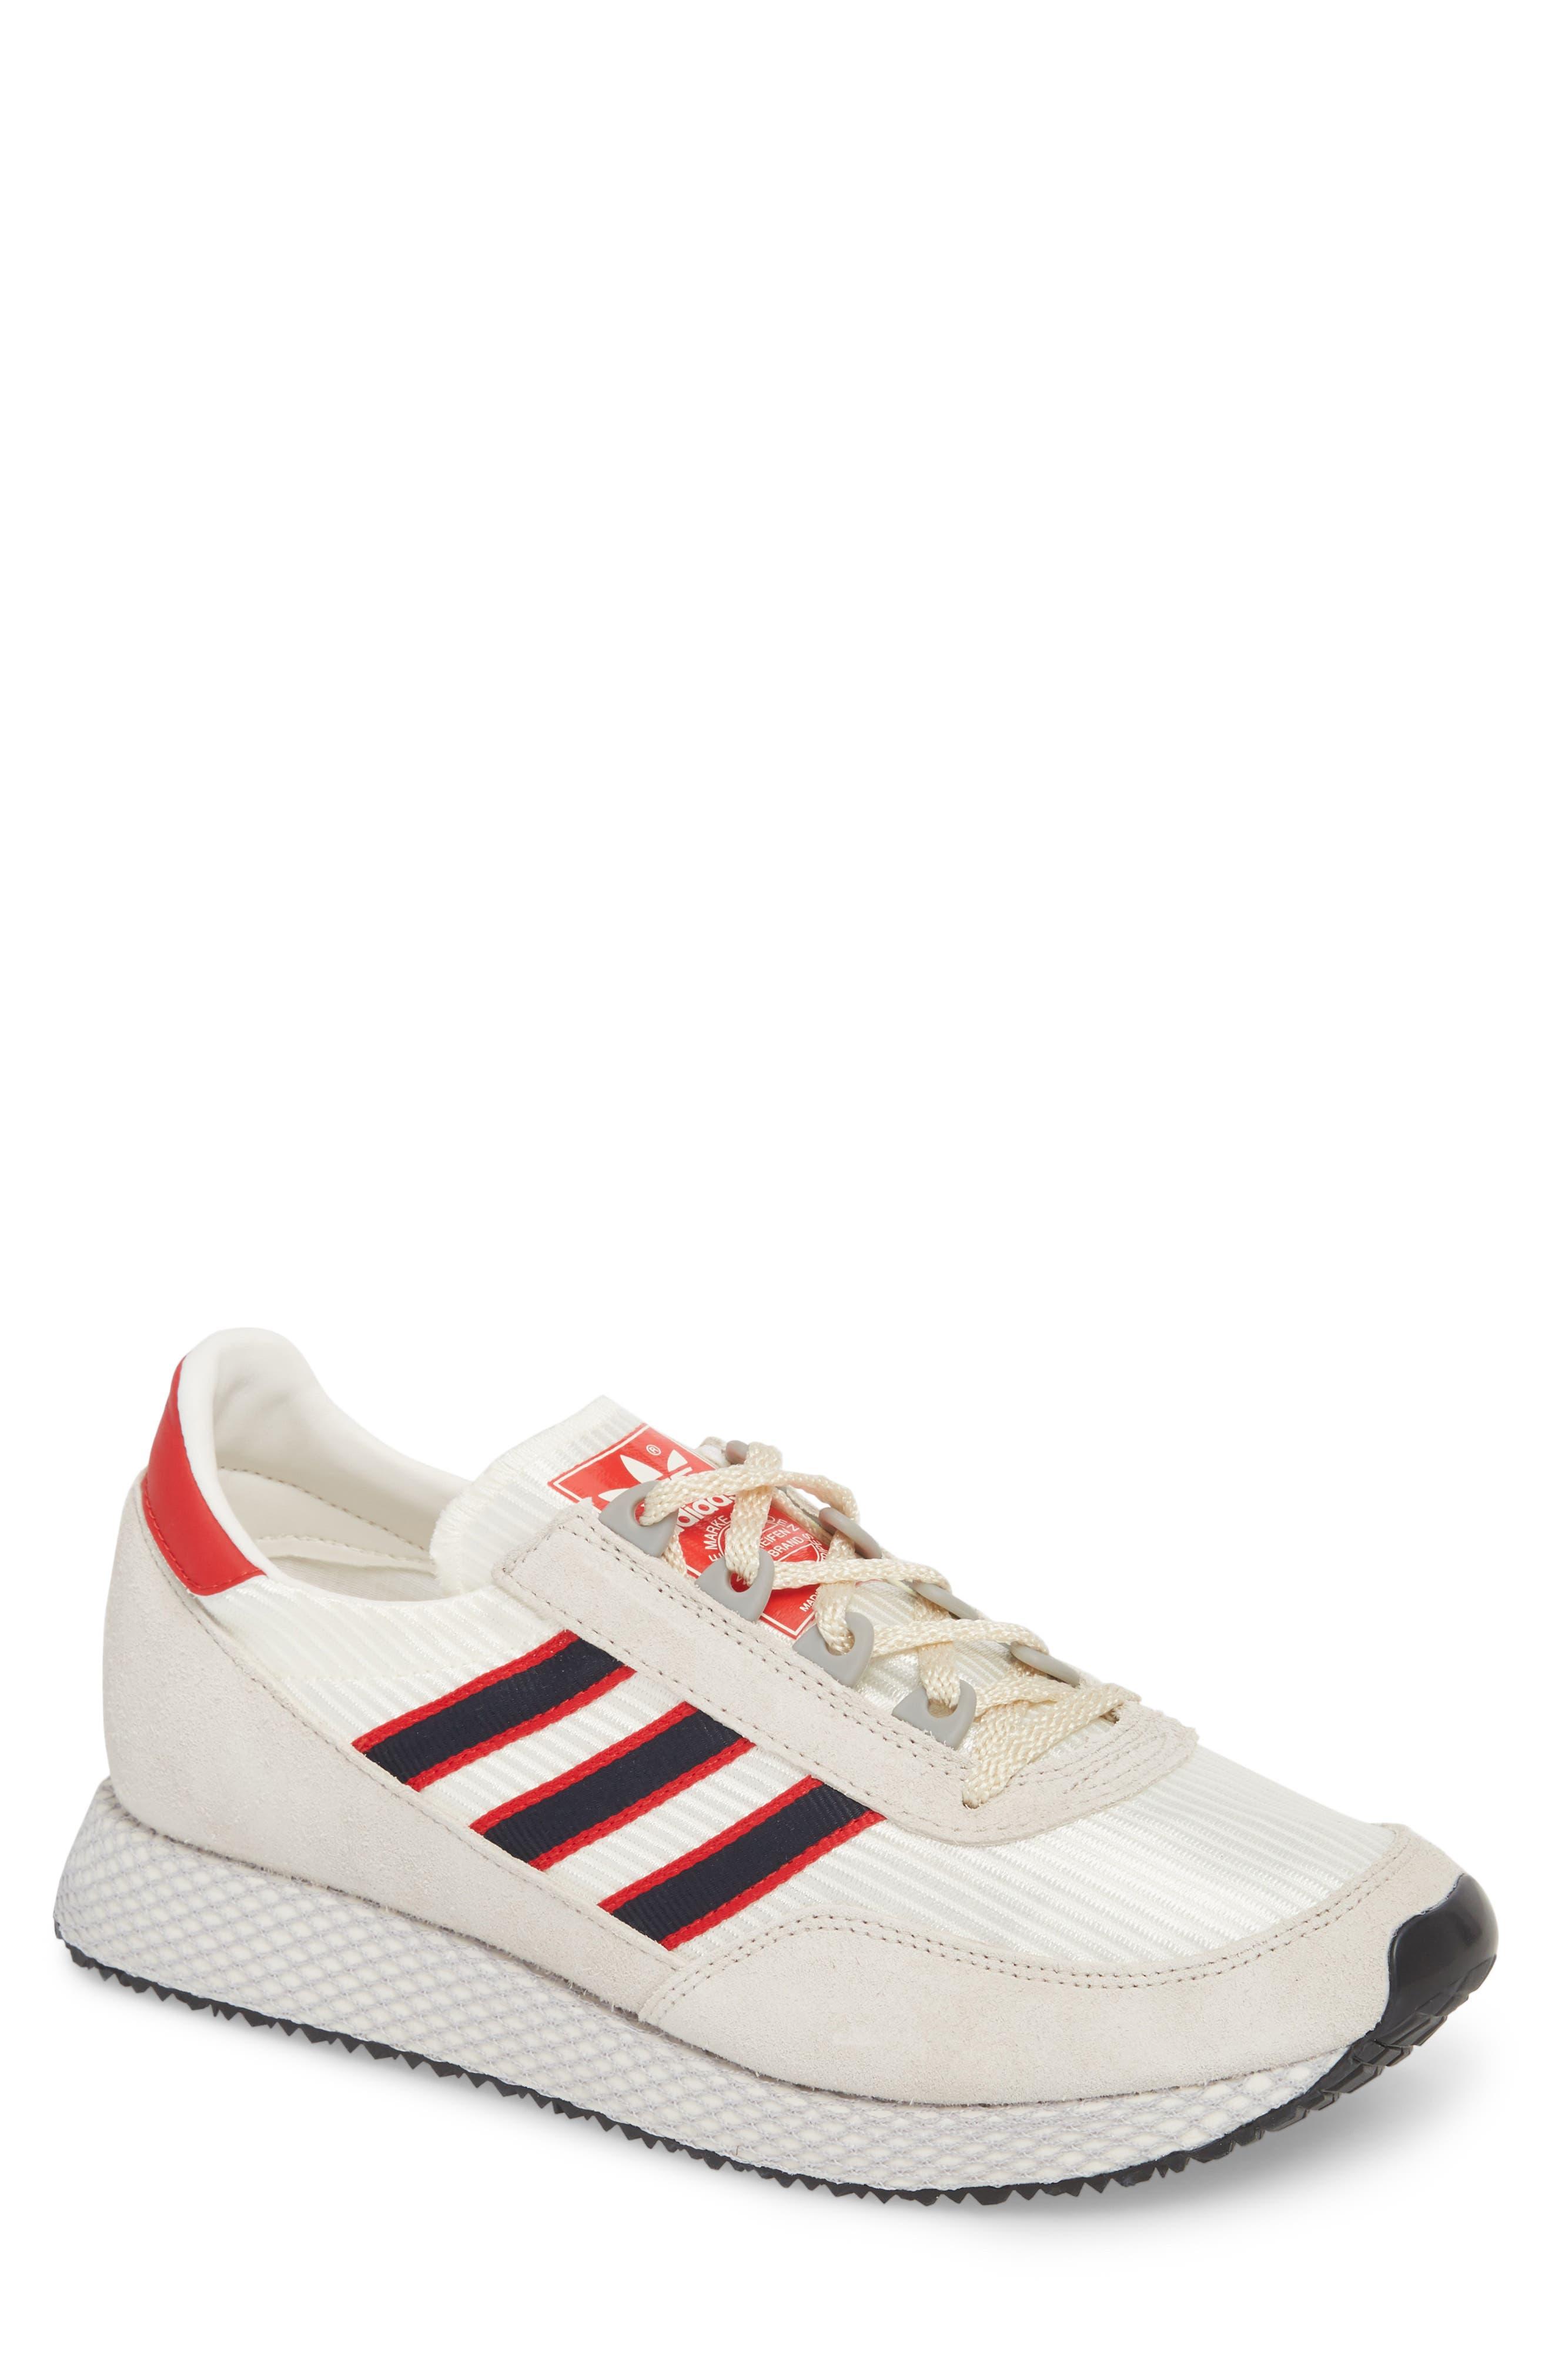 Glenbuck SPZL Sneaker,                             Main thumbnail 1, color,                             250